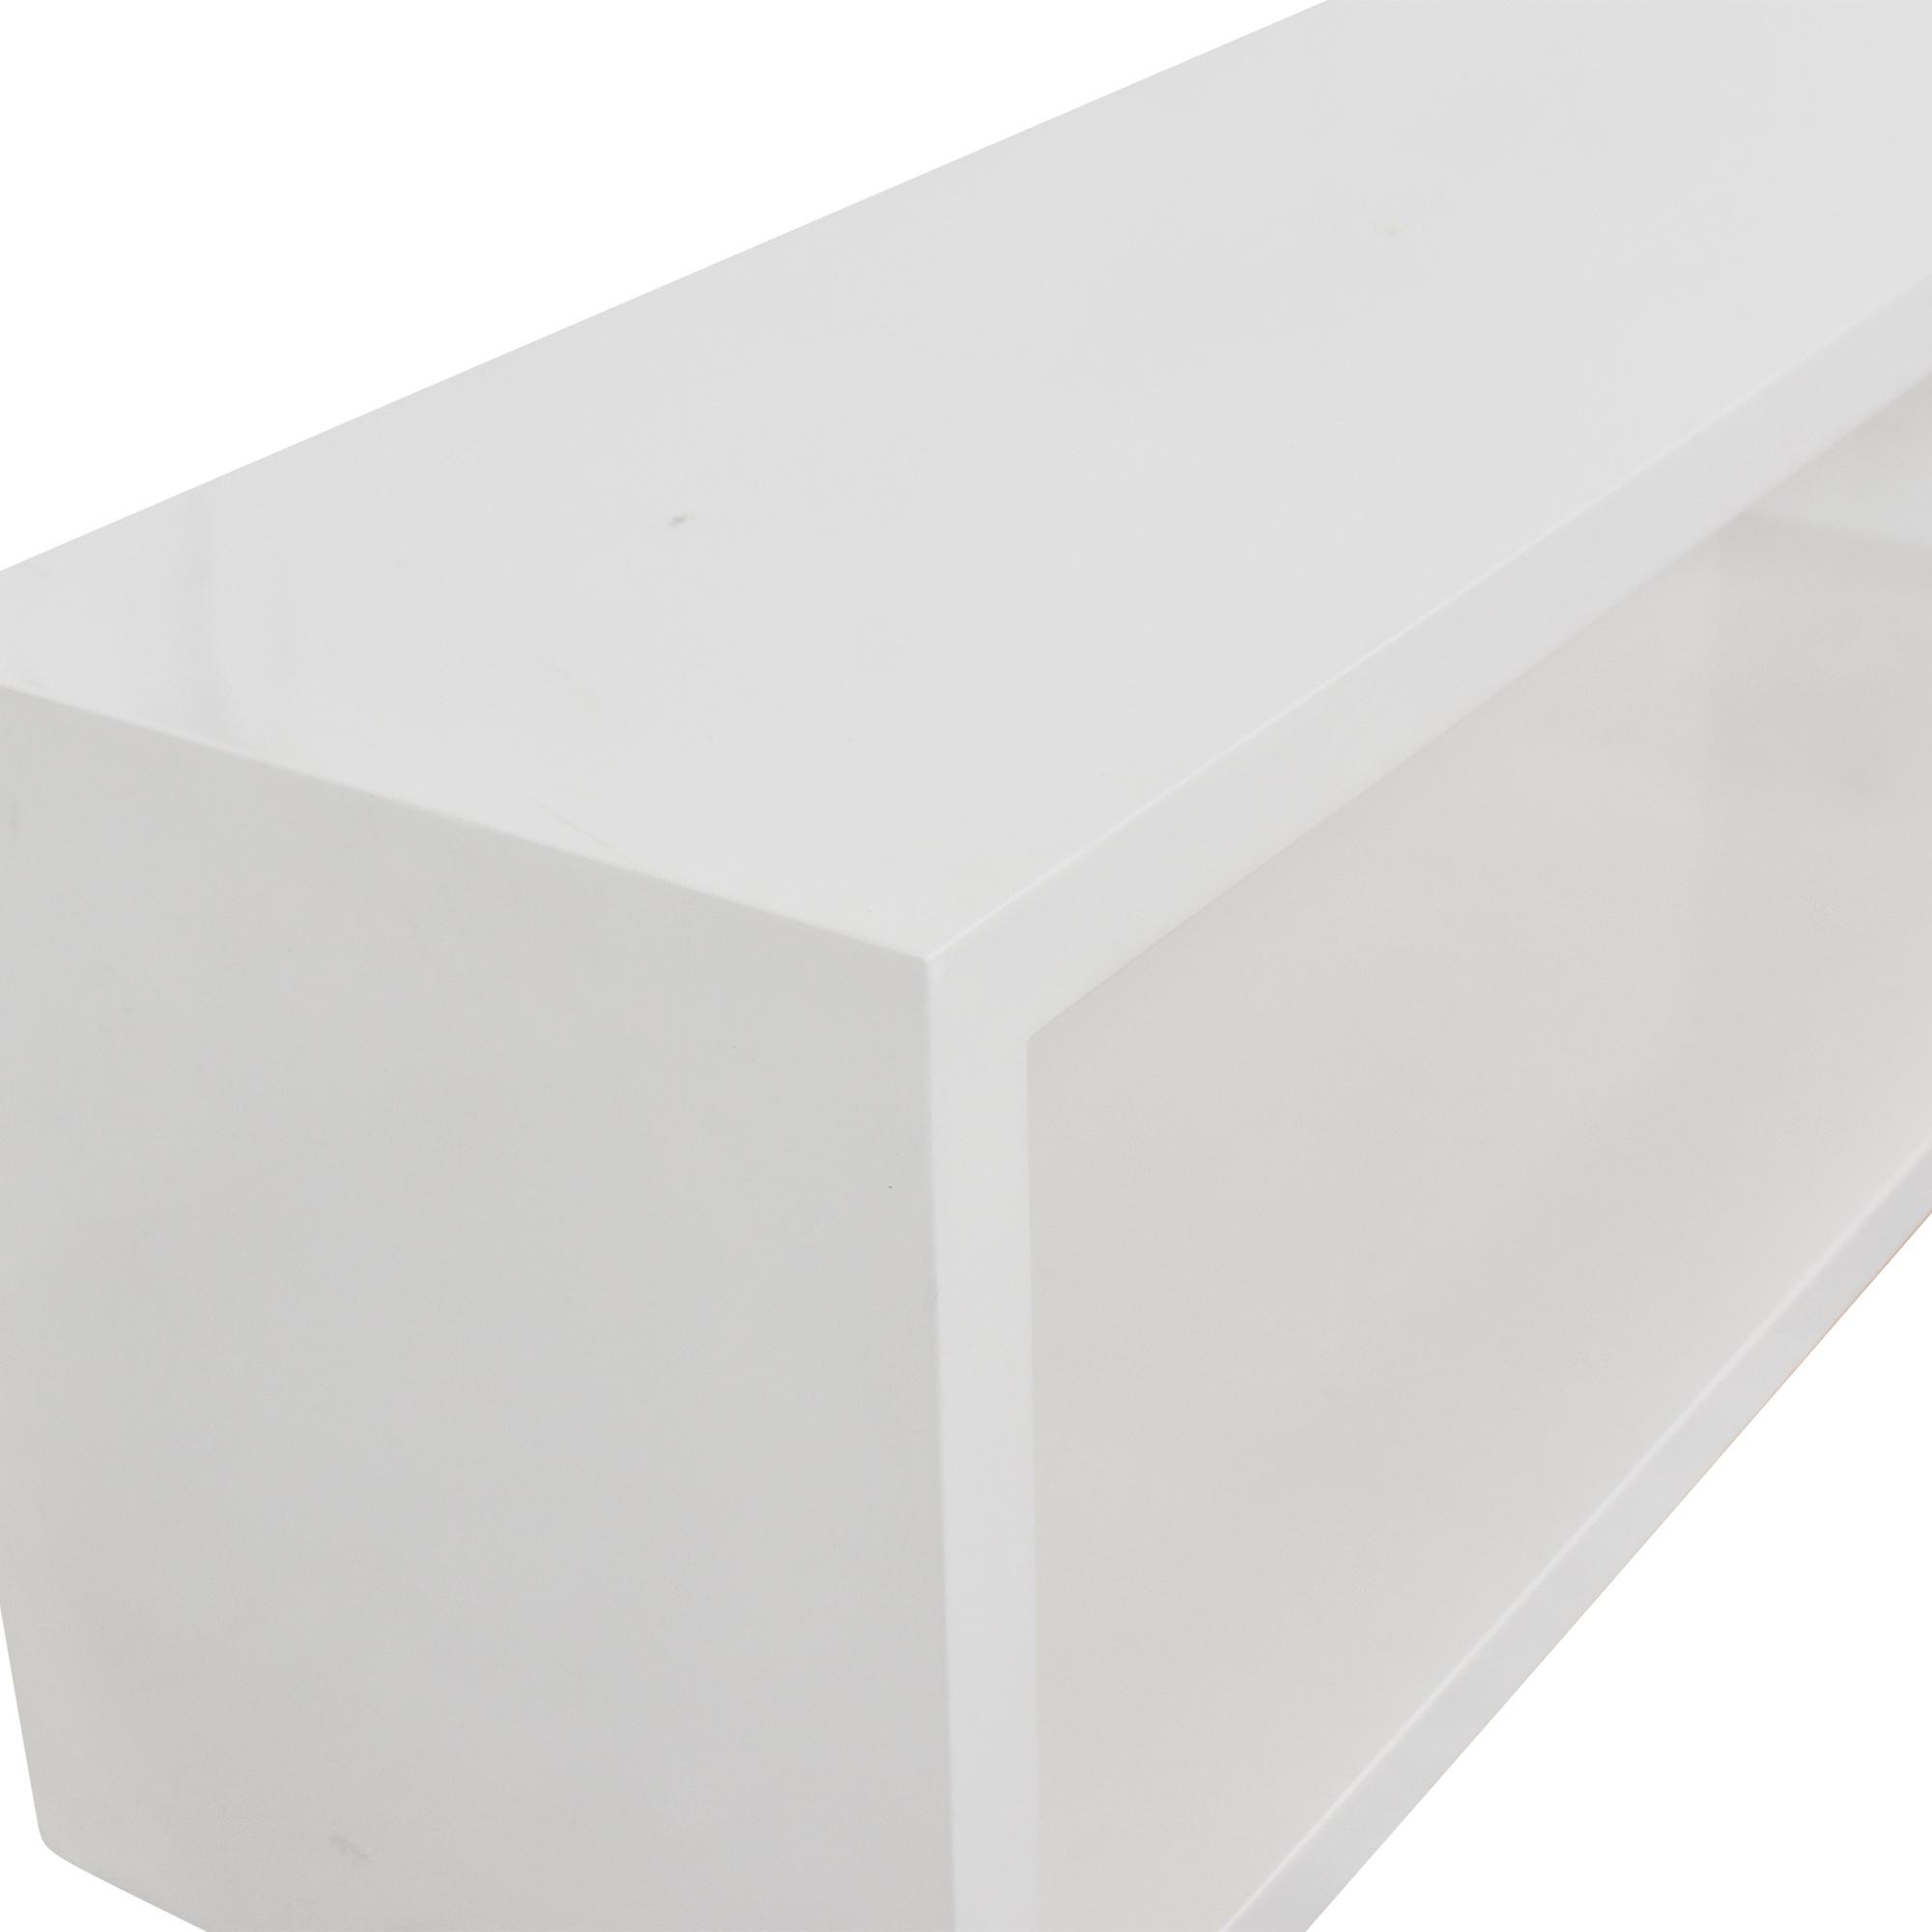 Crate & Barrel Aspect Modular Open Storage Unit / Storage